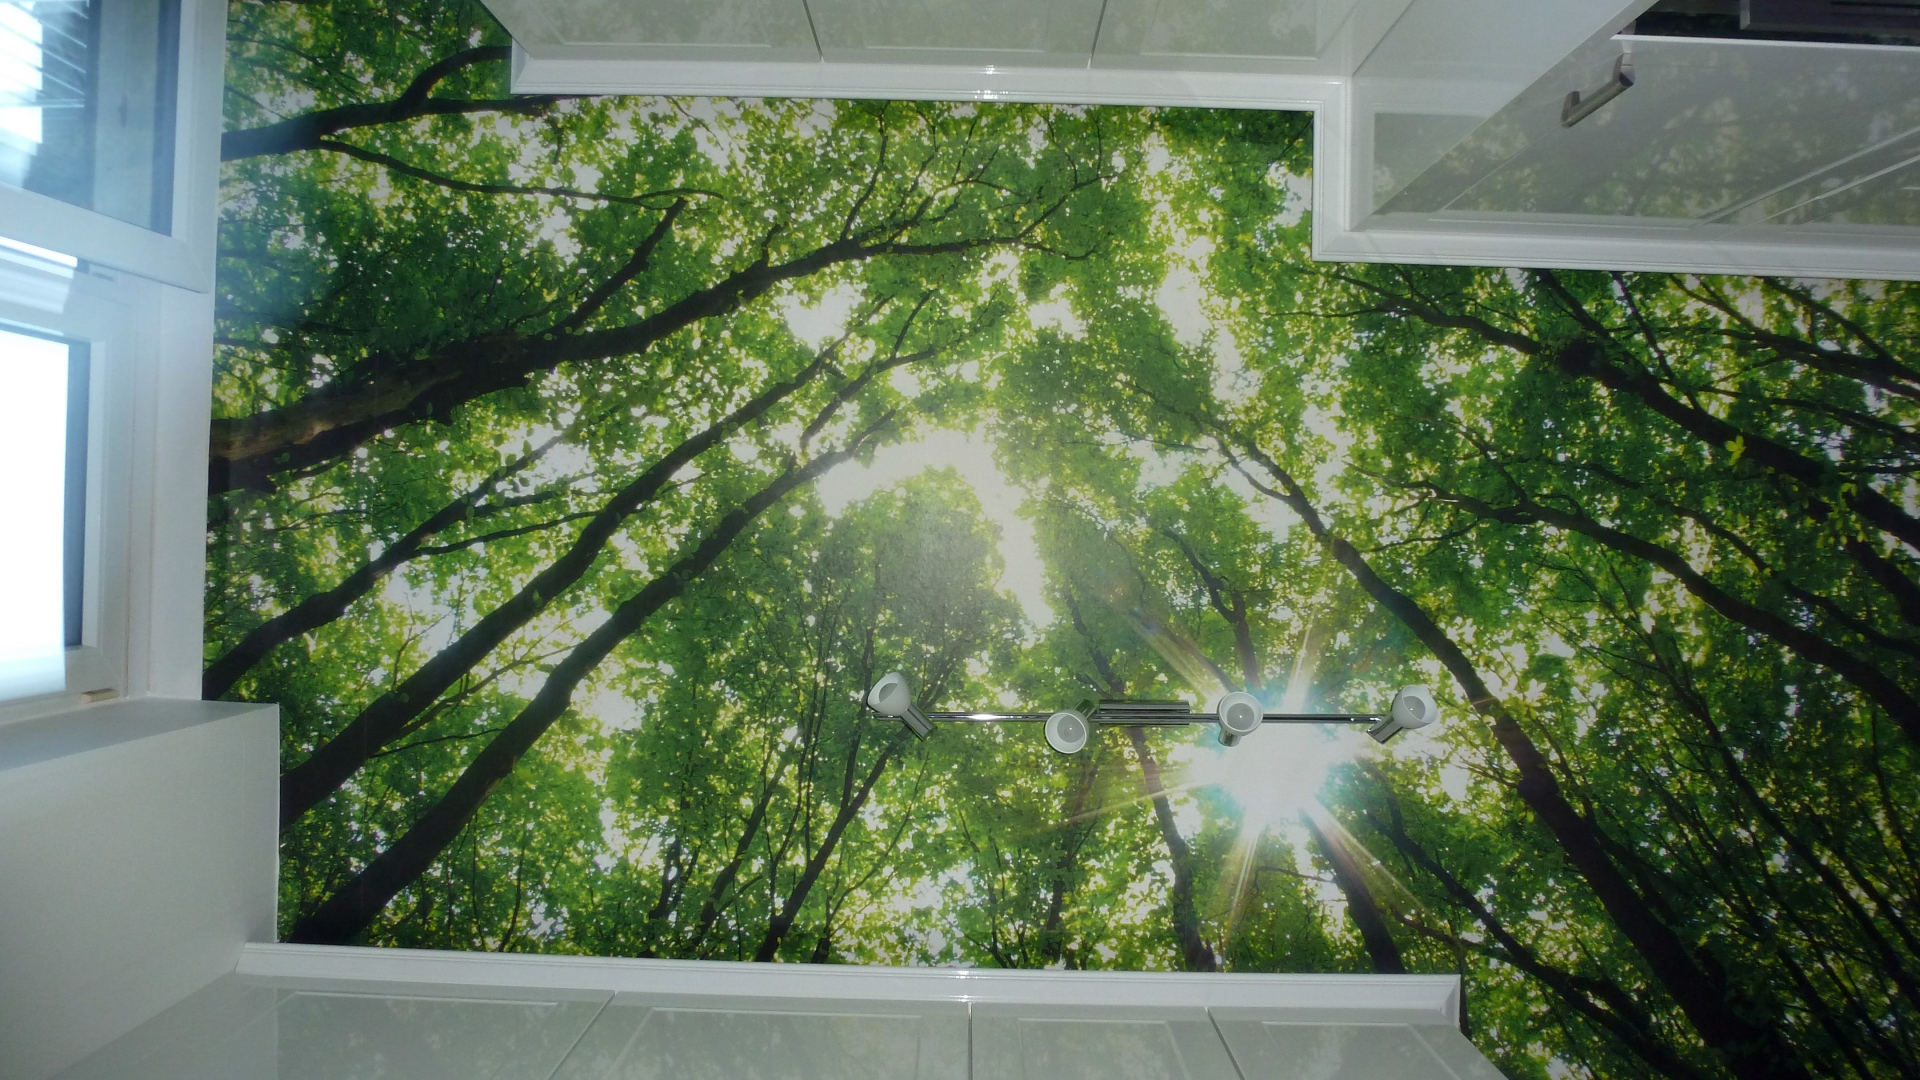 Maler Wedel Hamburg Innenarbeiten Tapete Decke Baumkronen